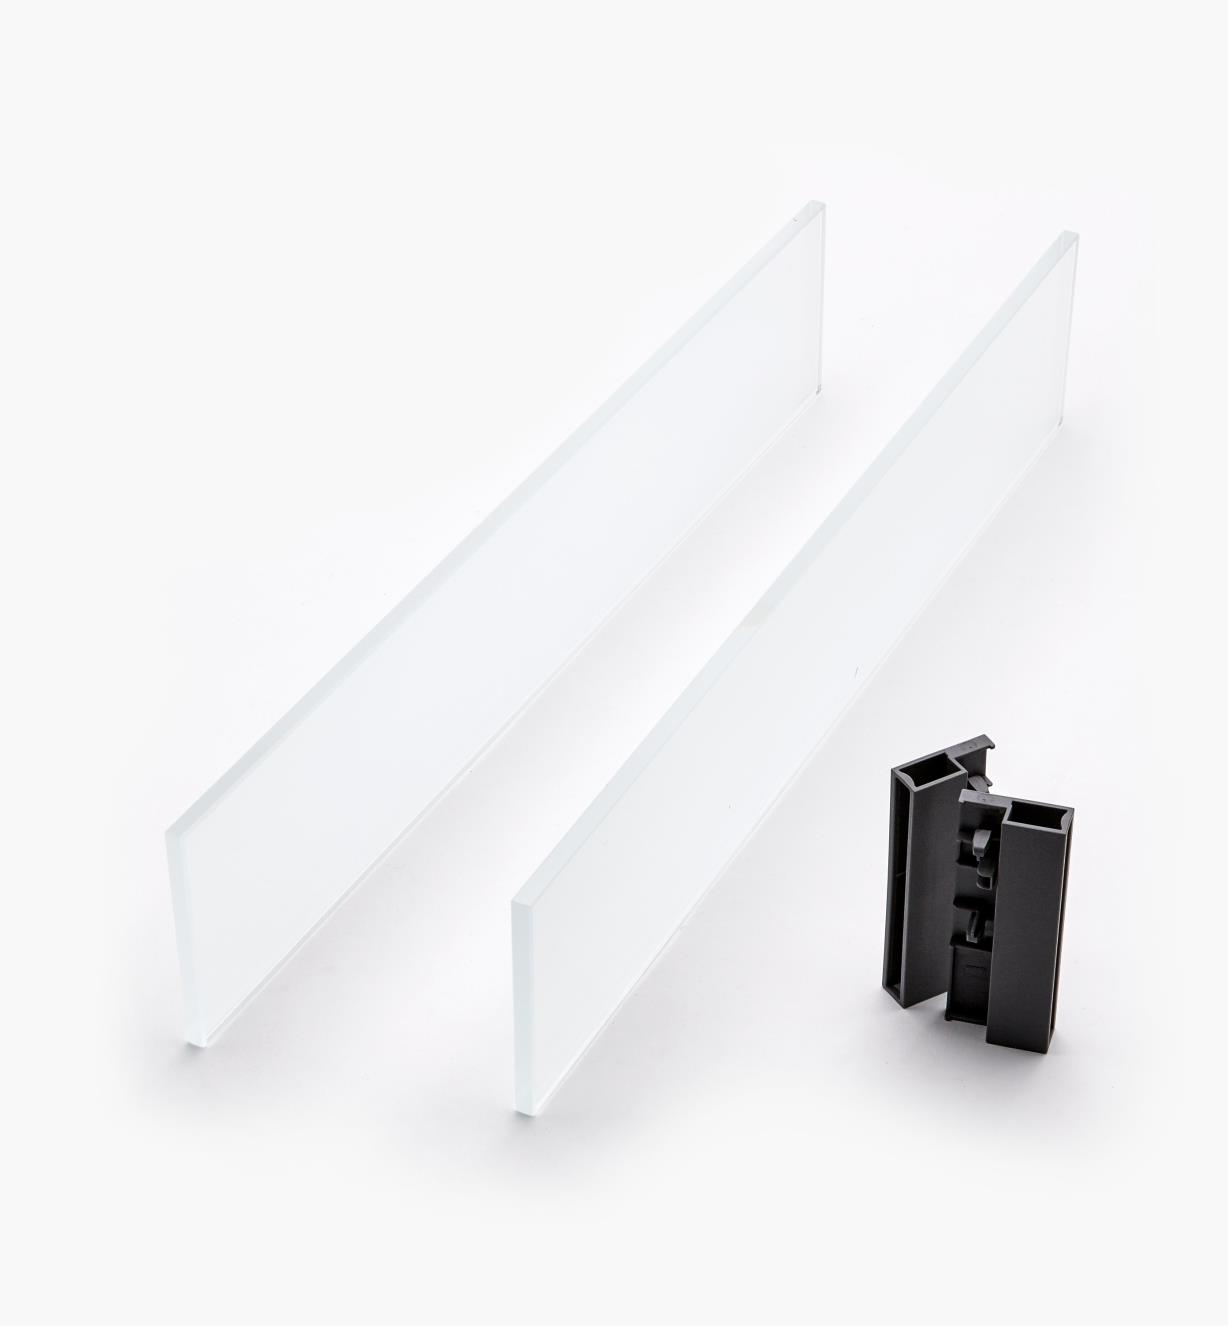 02K2851 - Glass Insert Panels for Blum Tandembox Antaro Soft-Close Type D 500mm Drawer Kit